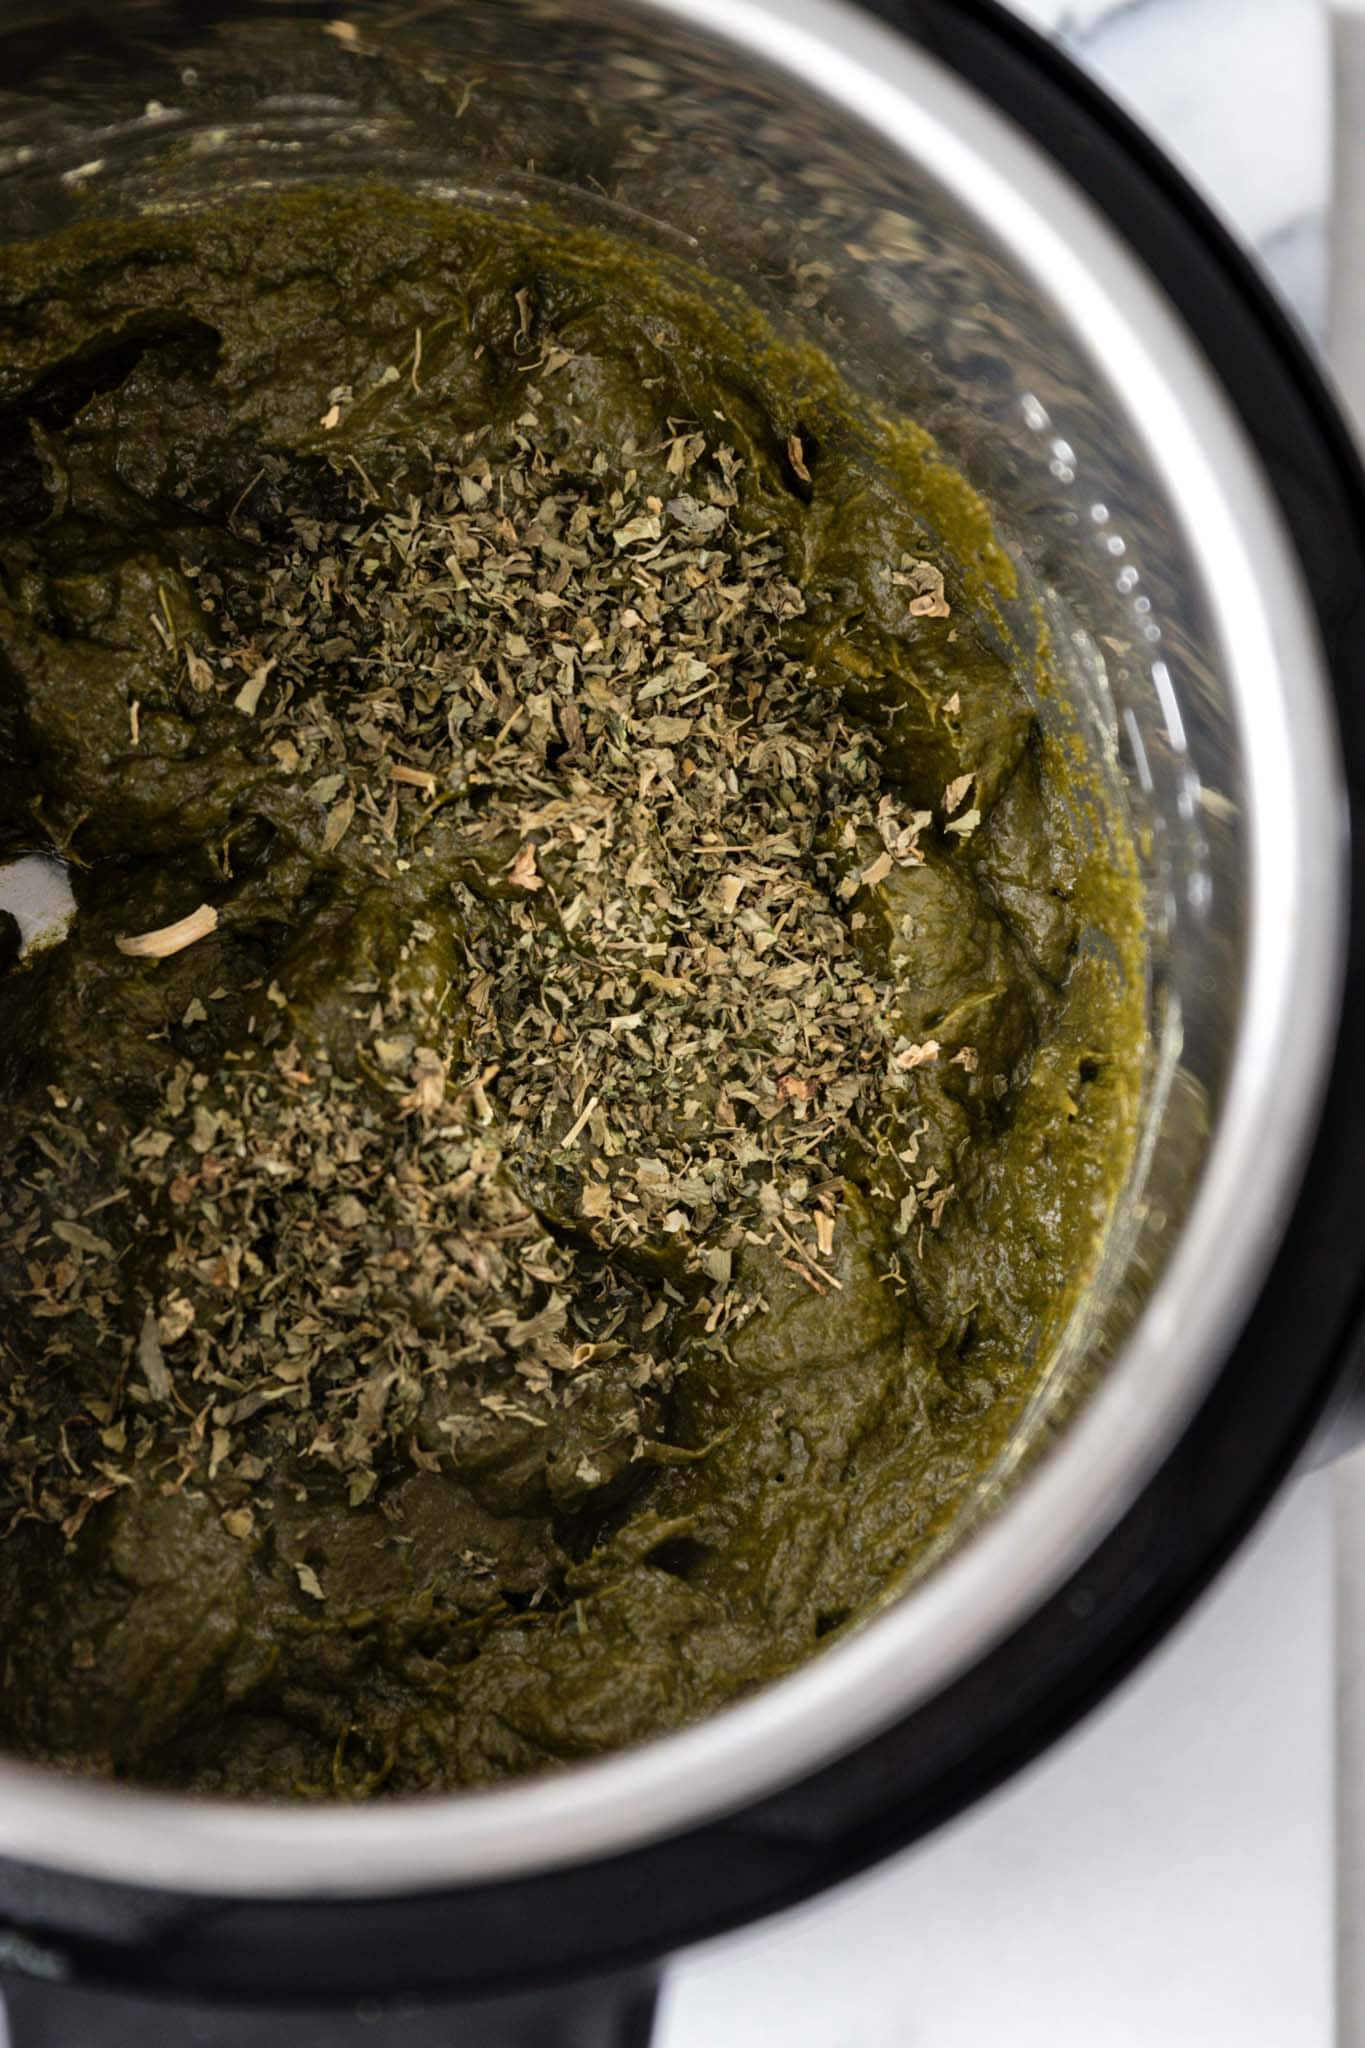 Adding dried fenugreek leaves (methi) to the Instant Pot for Sarson Ka Saag